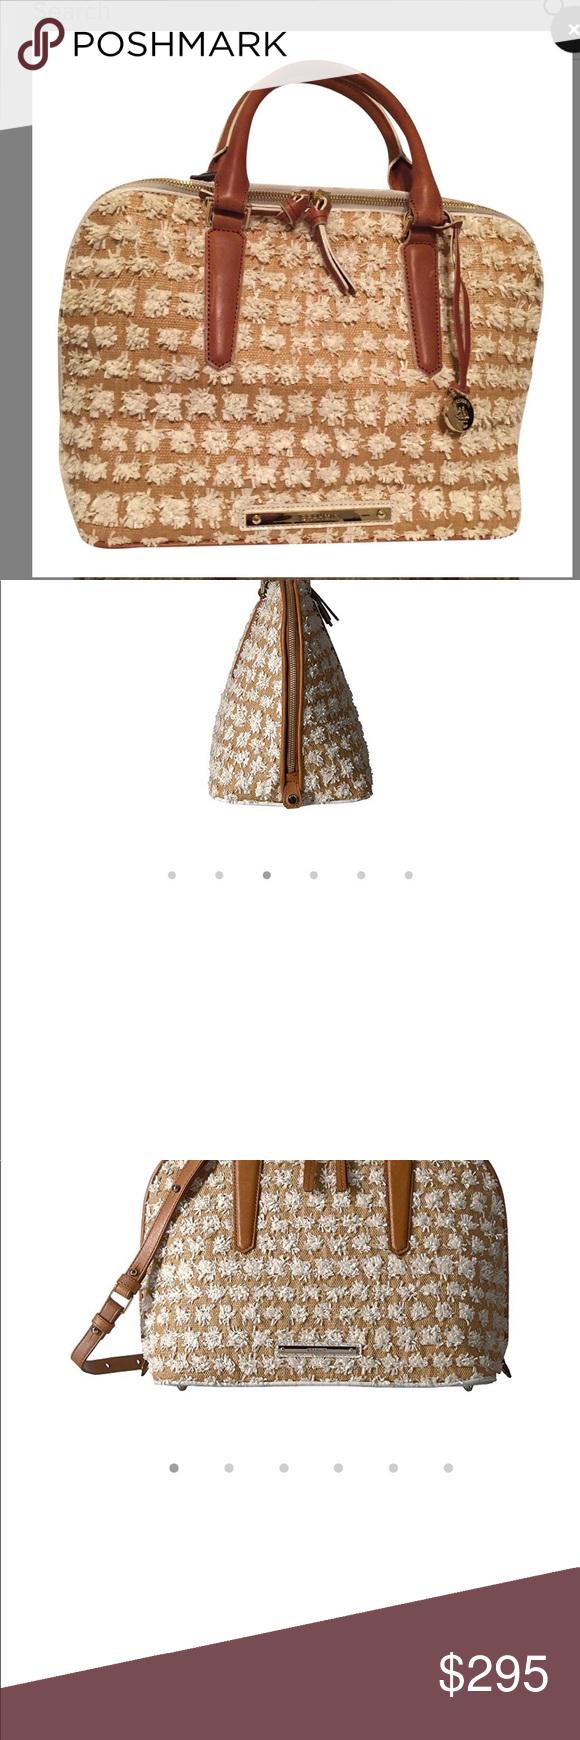 NWT Brahmin Handbag Brahmin Vivian White Bora Leather Handbag with white  puffs raffia adds a fun flair for a Great summer bag!! Pretty tan and white  with ... fc5769c34a